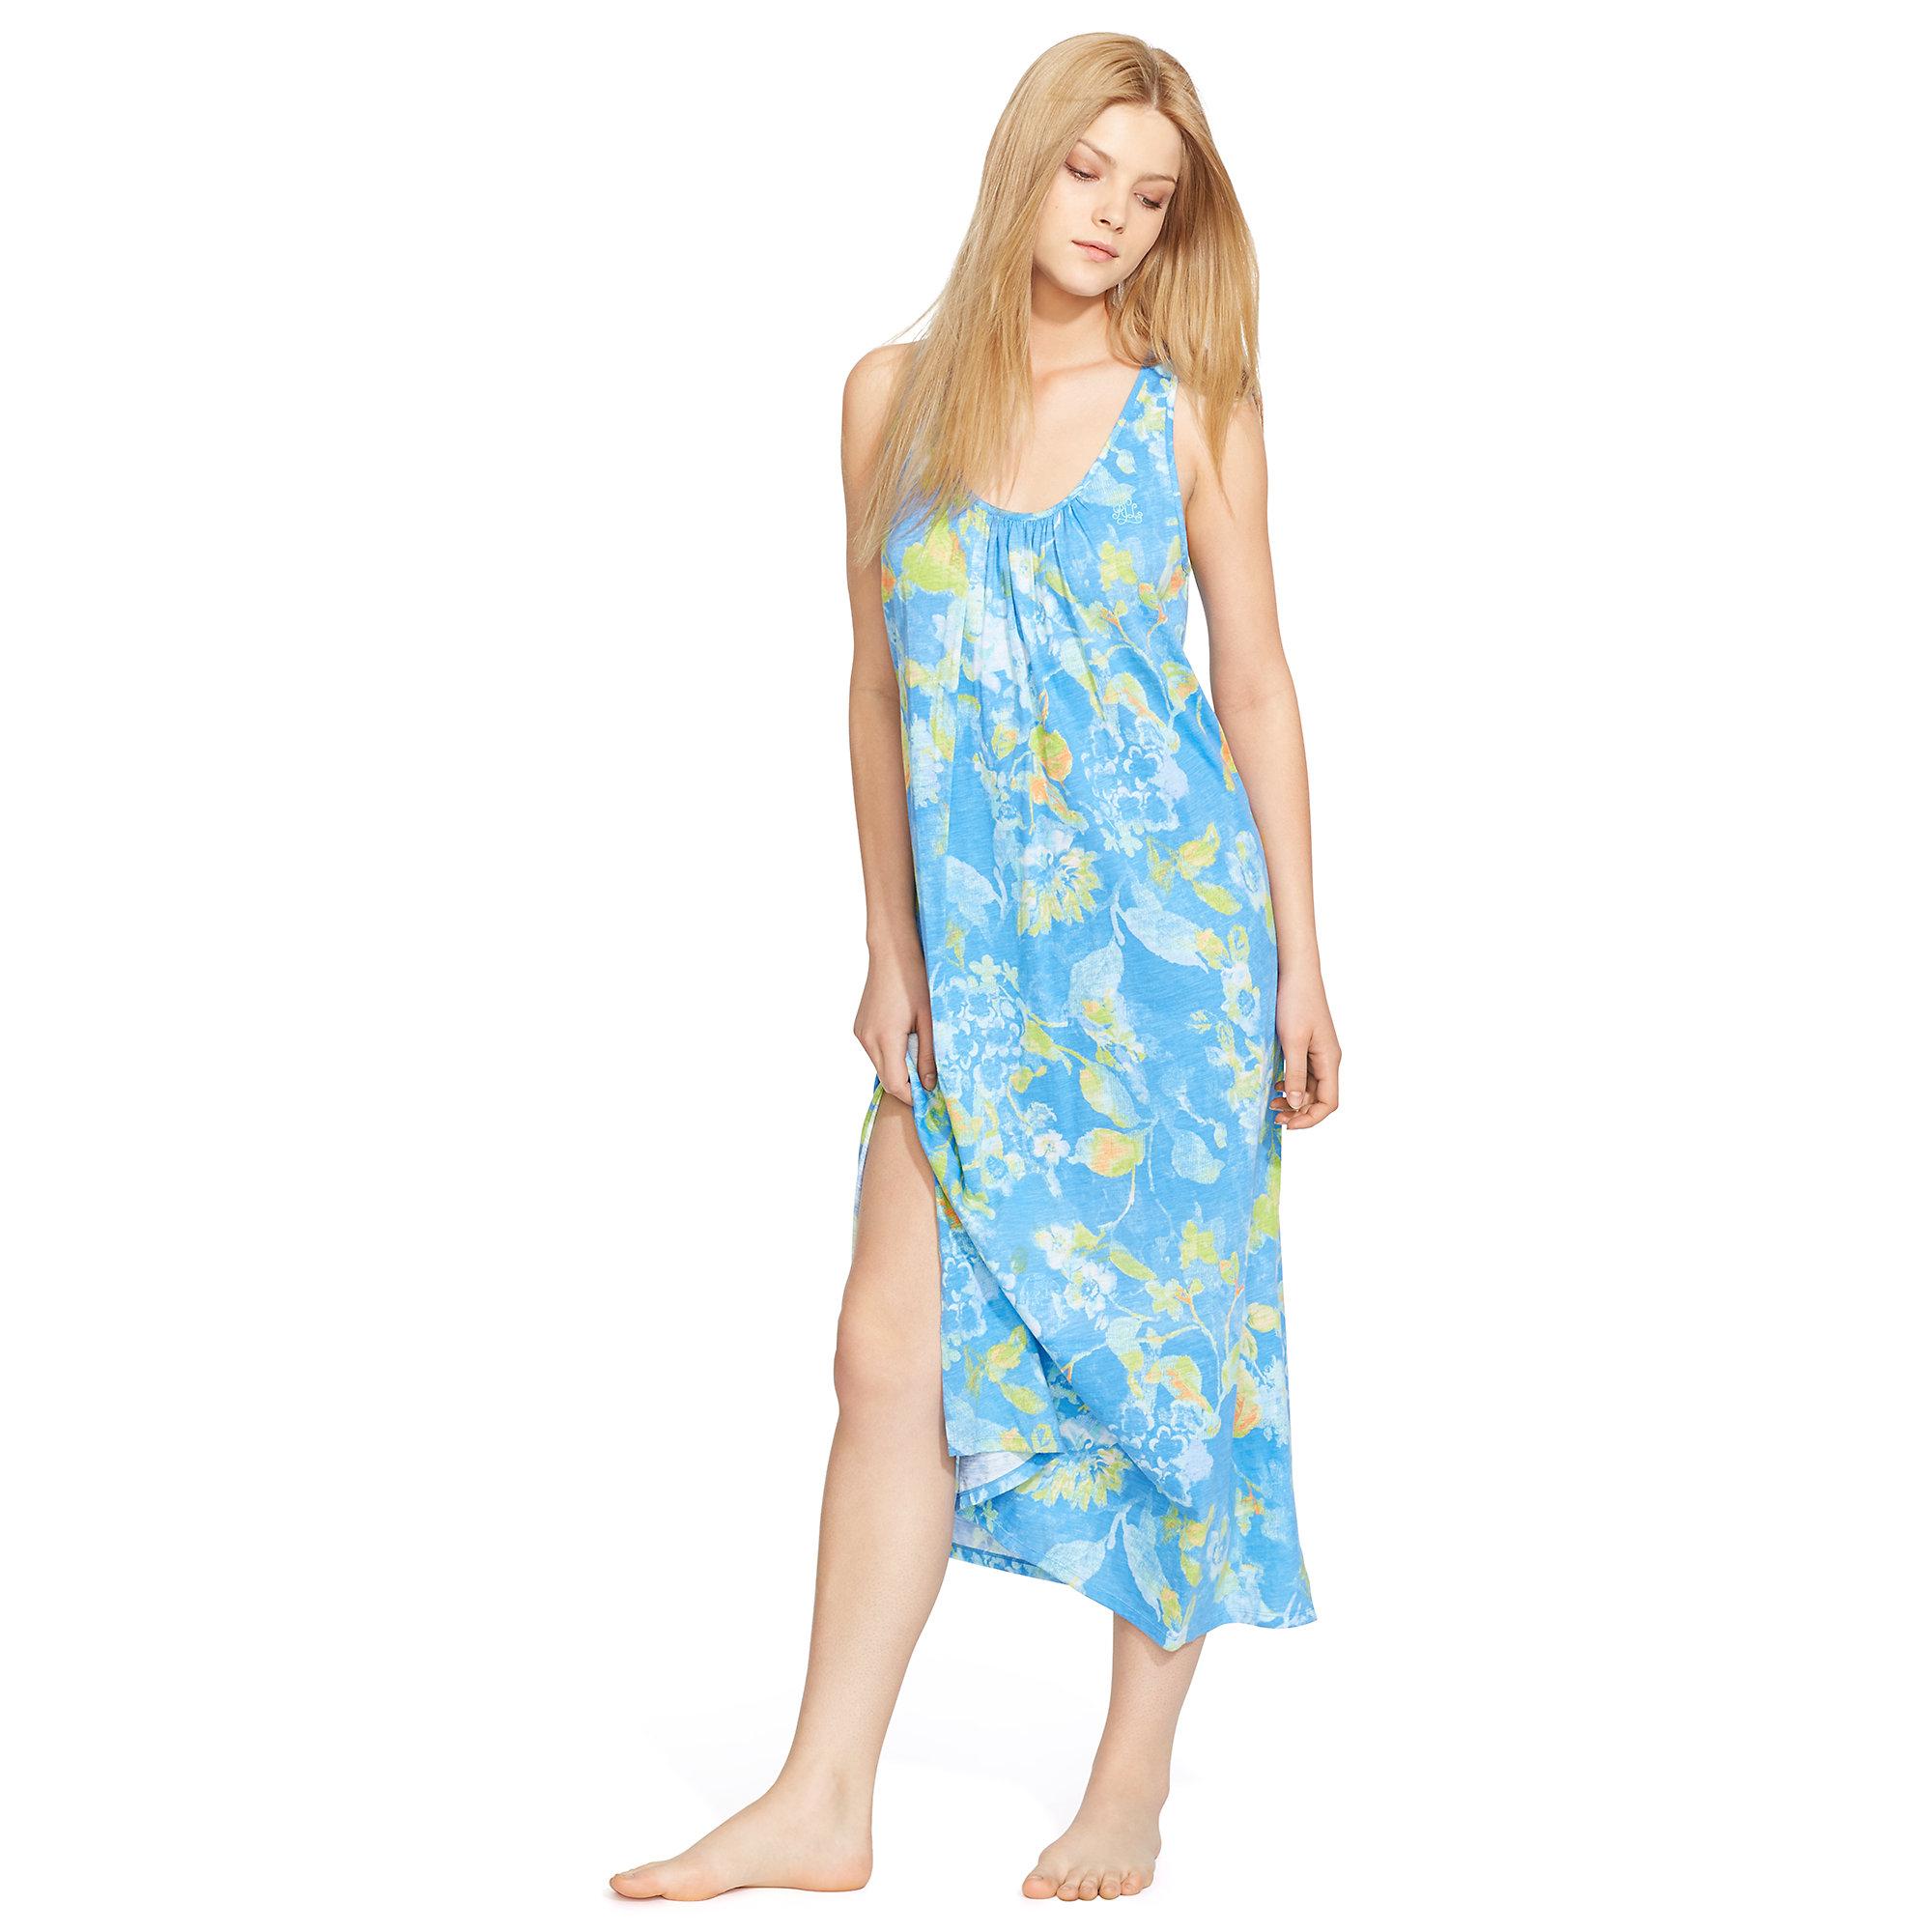 Sleeping Gown: Ralph Lauren Floral Cotton Long Sleep Gown In Blue